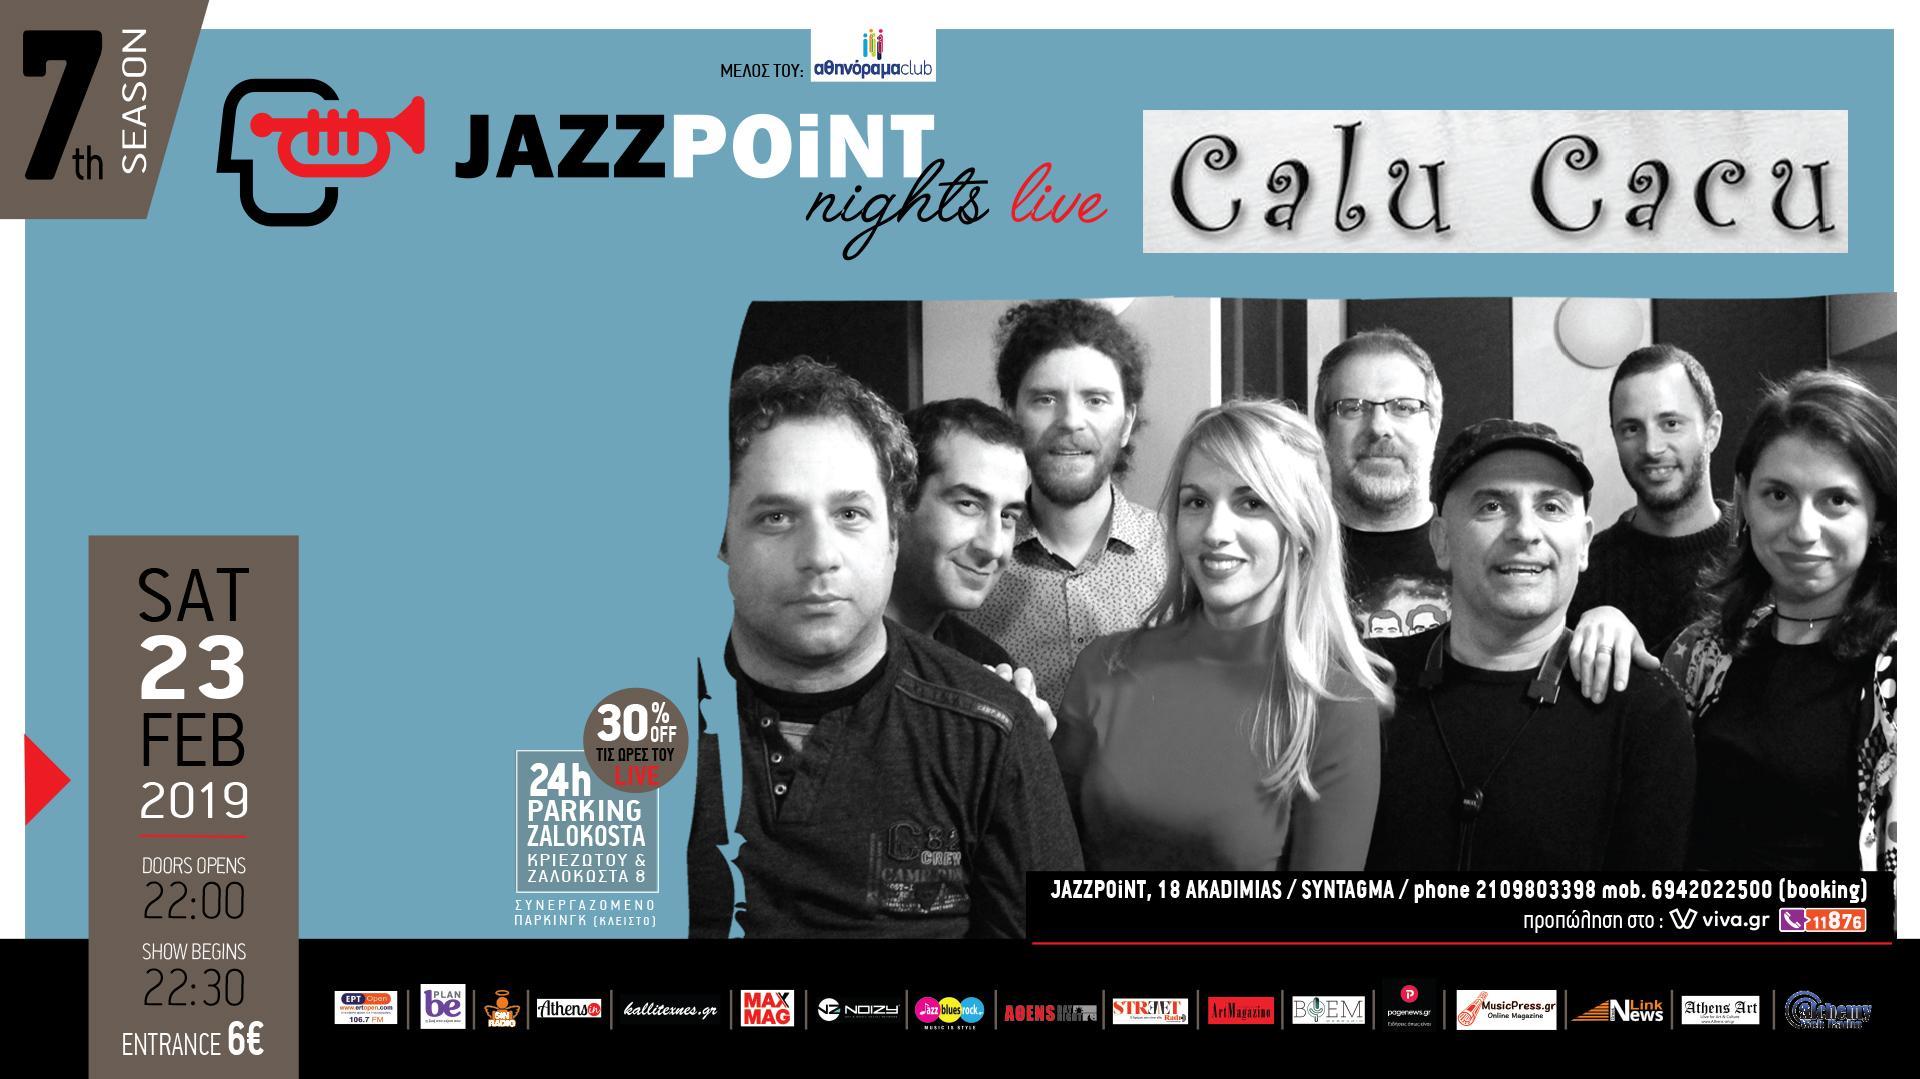 """ Calu Cacu "" πάρτυ γεμάτο χορό στο Jazz Point"